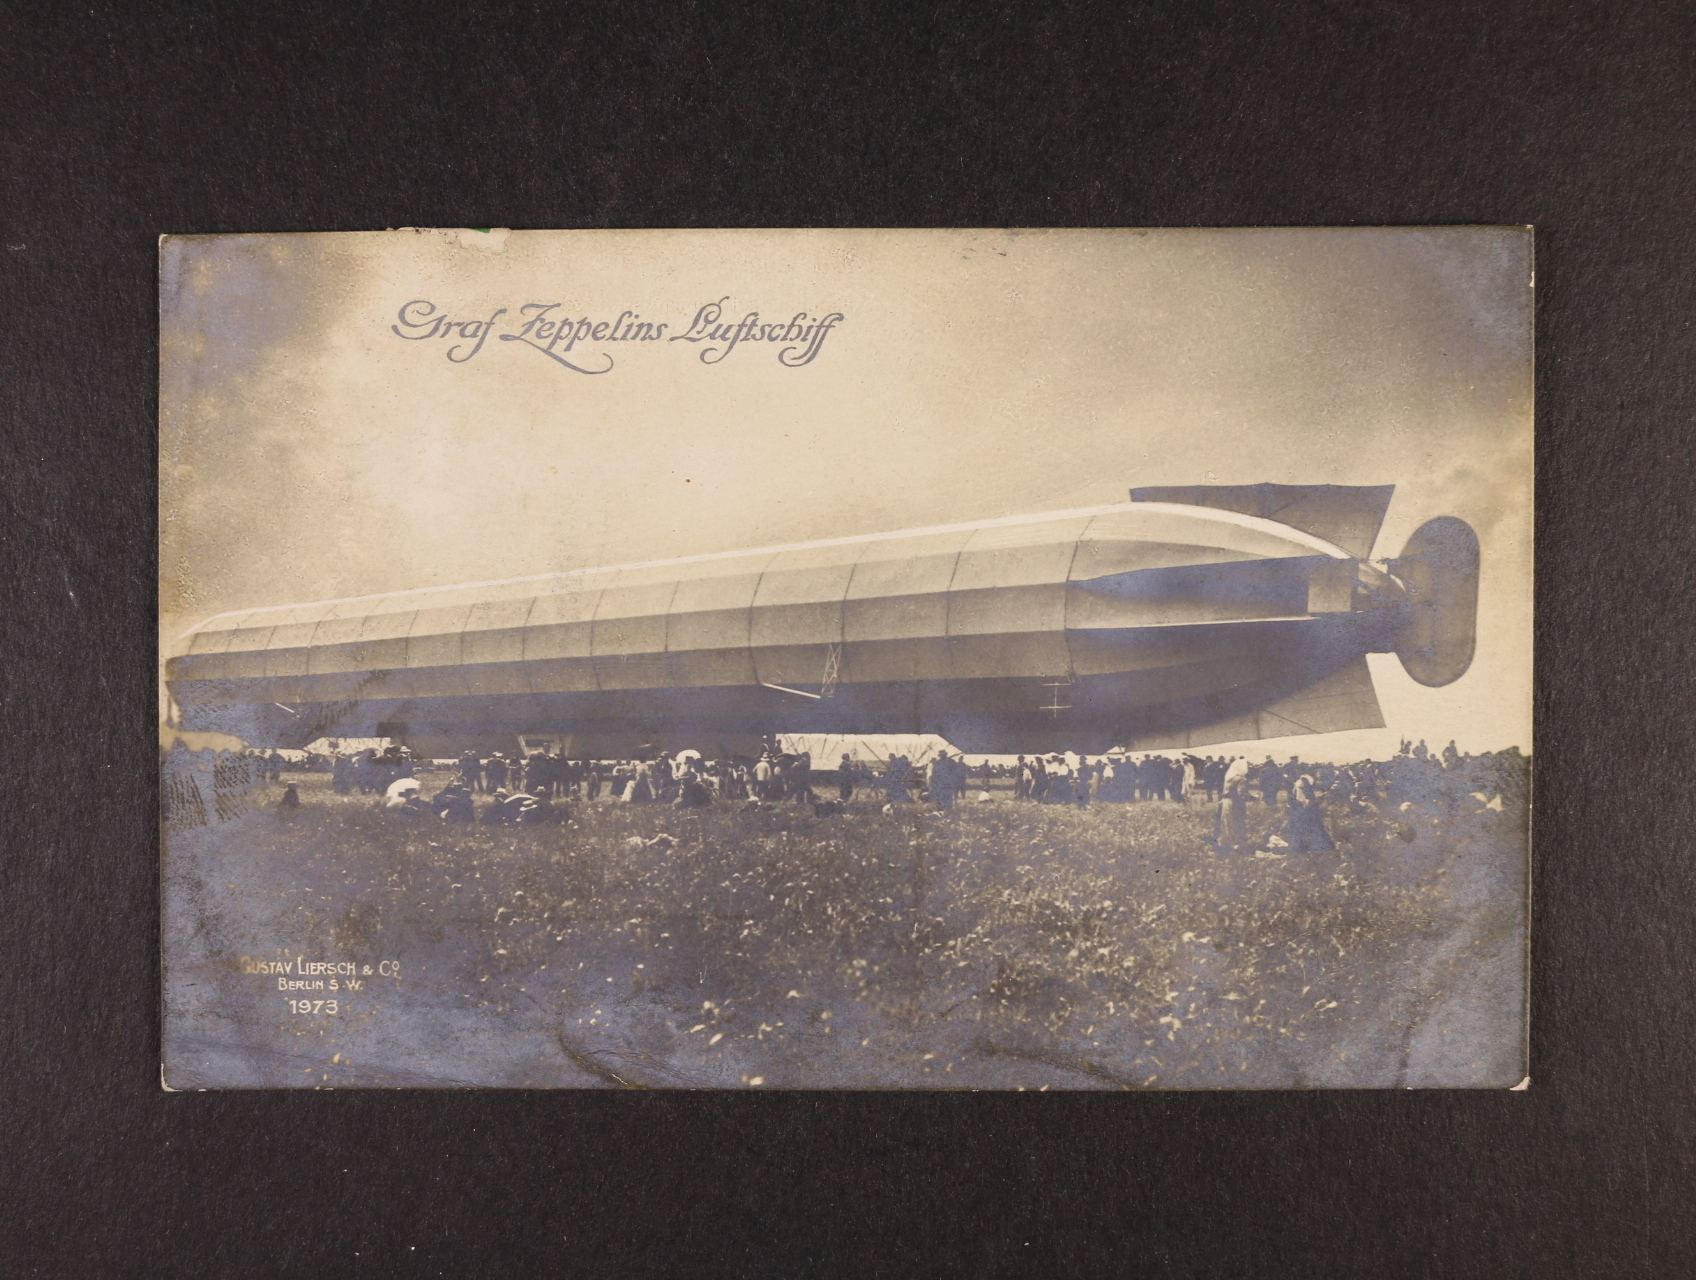 jednobarevná fotopohlednice Graf Zeppelins Luftschiff